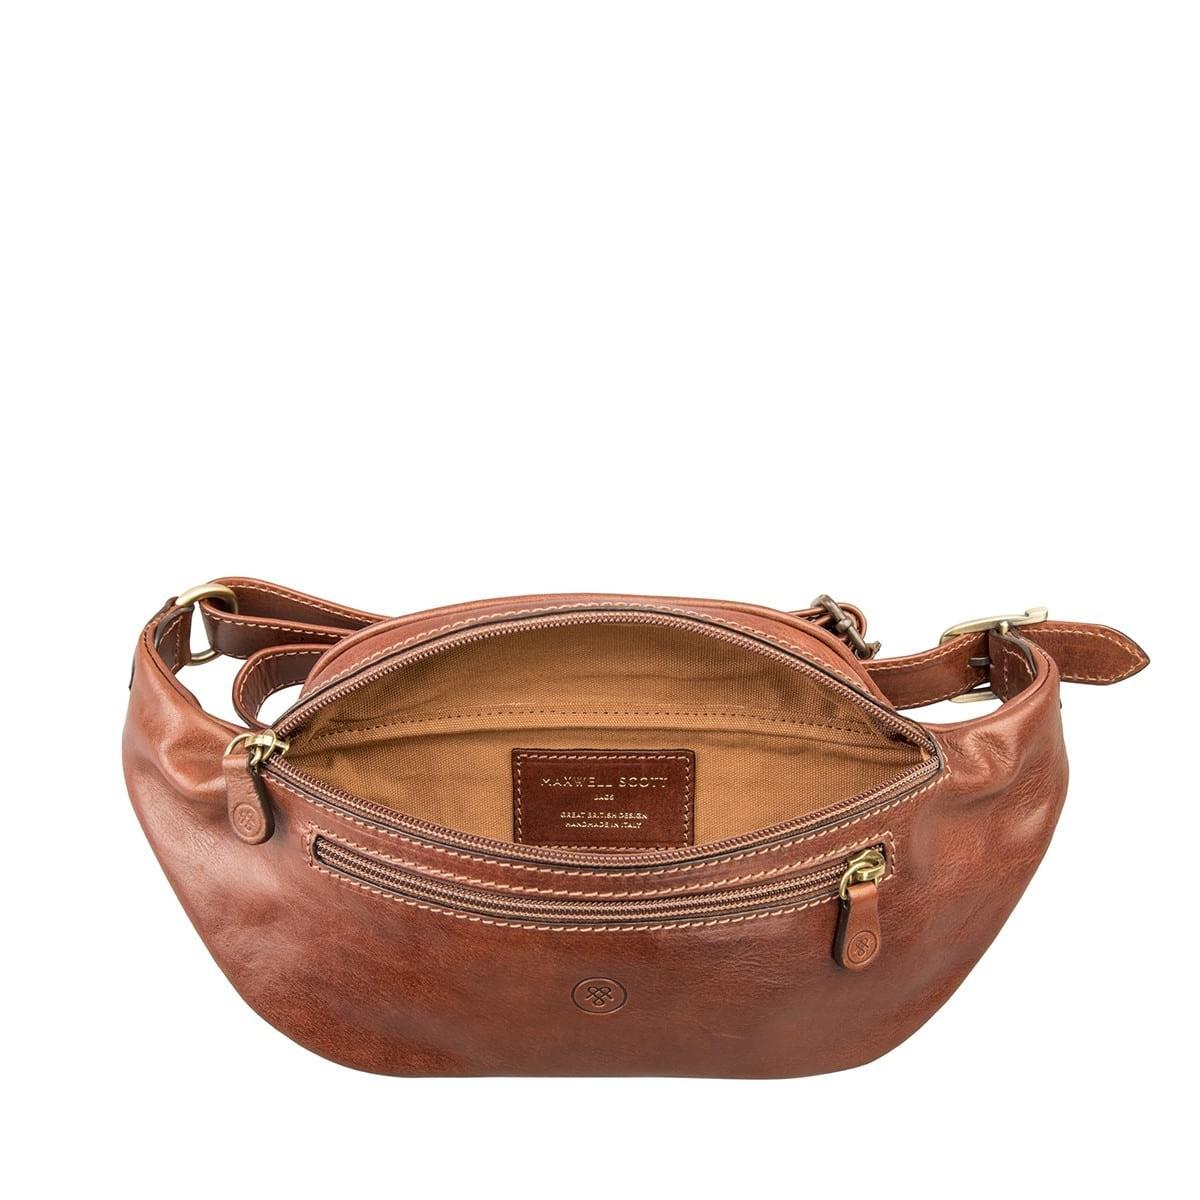 1f3828622a Centolla - Luxury Italian Leather Bum Bag   Sovereign Aviation